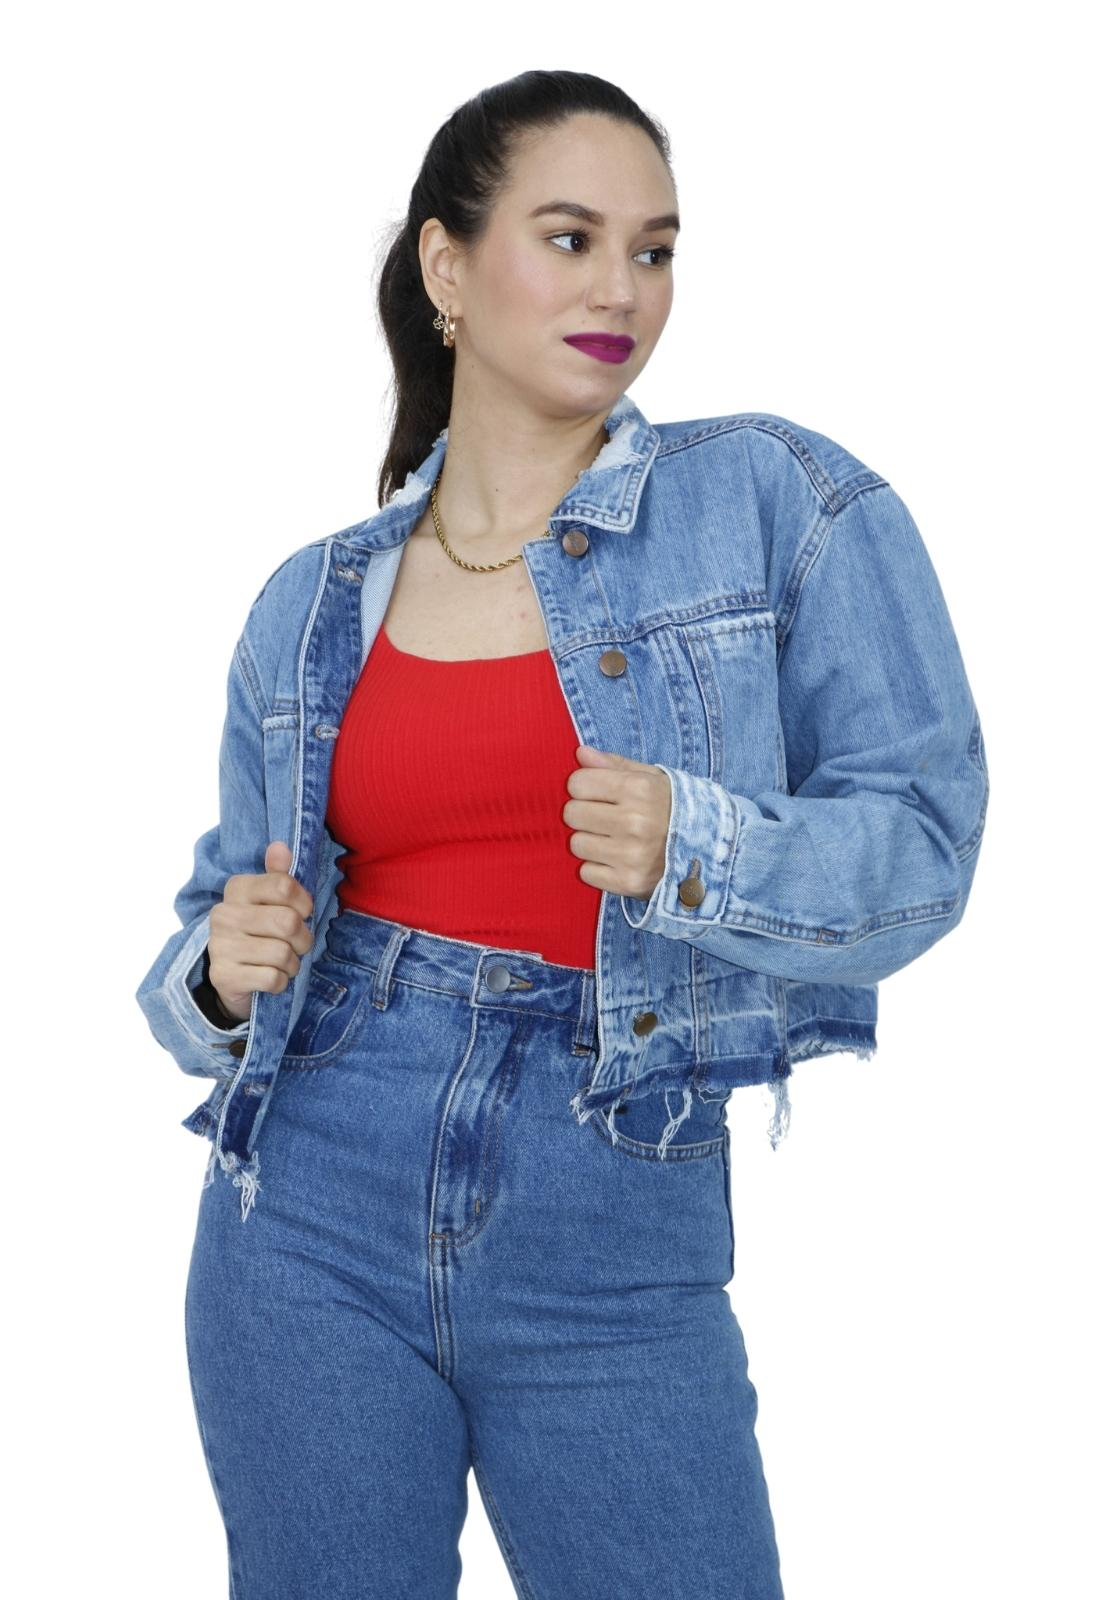 Jaqueta Feminina Cropped Jeans Médio Desfiada